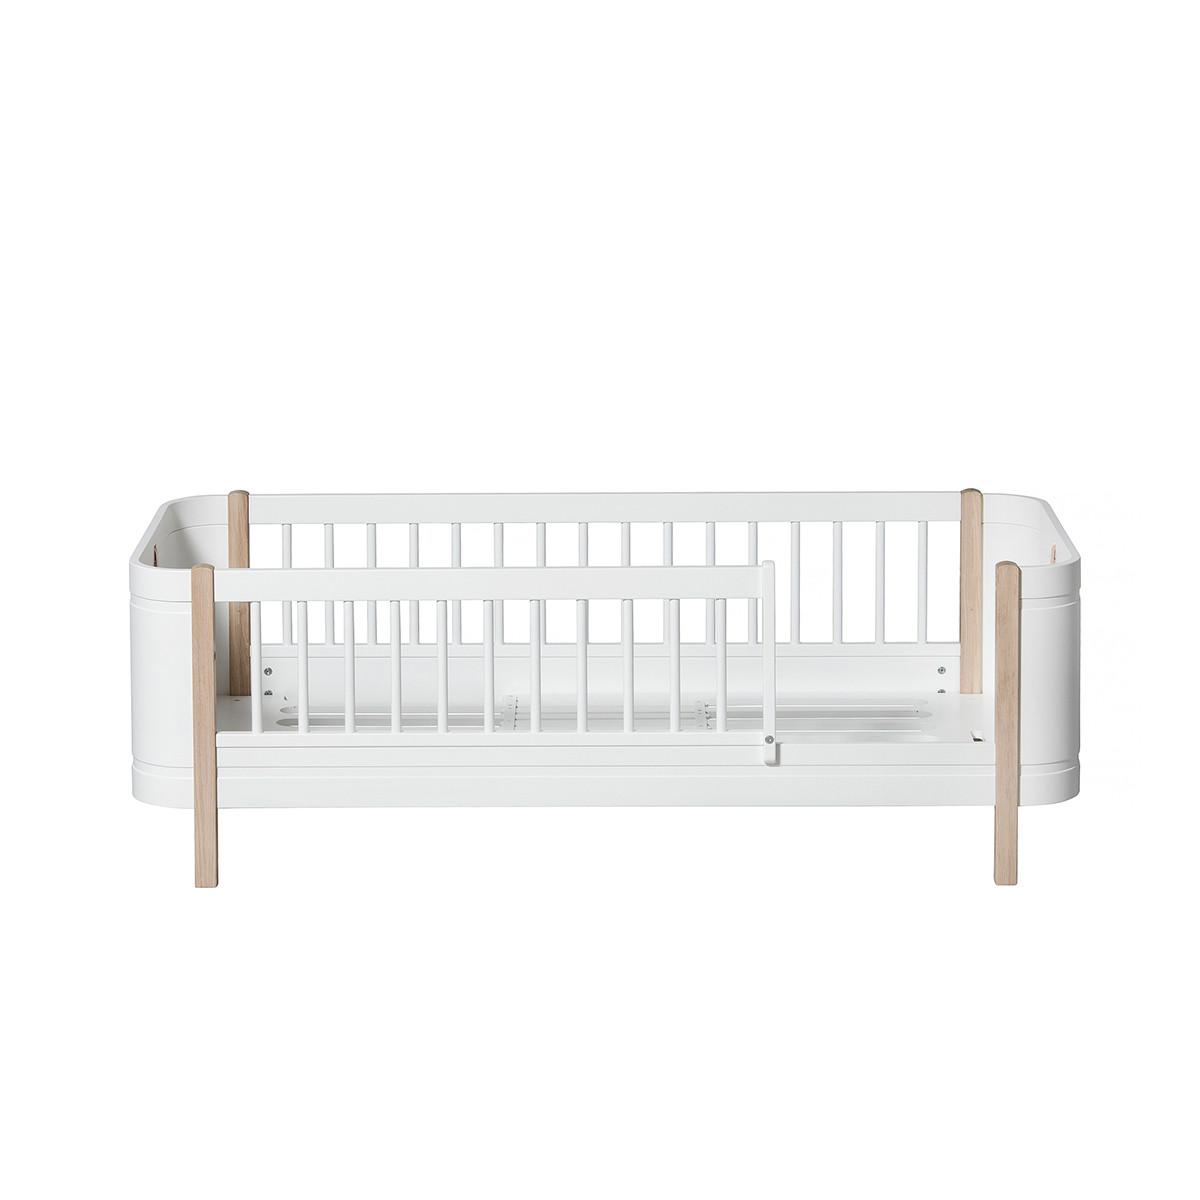 Juniorsäng Mini+ vit/ek, Oliver Furniture